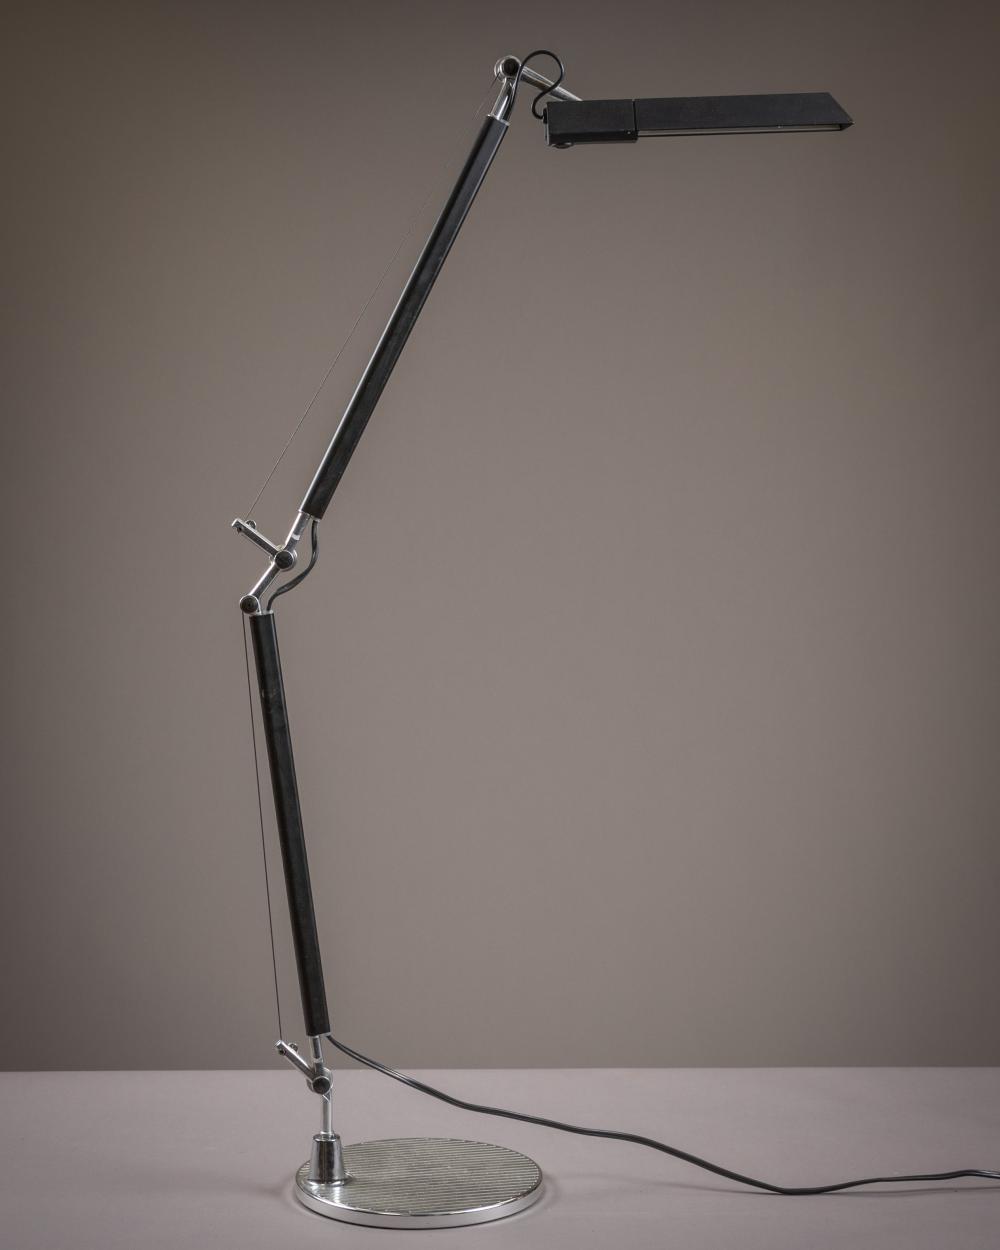 Fassina & de Lucchi - Artemide - Tolomeo Lamp